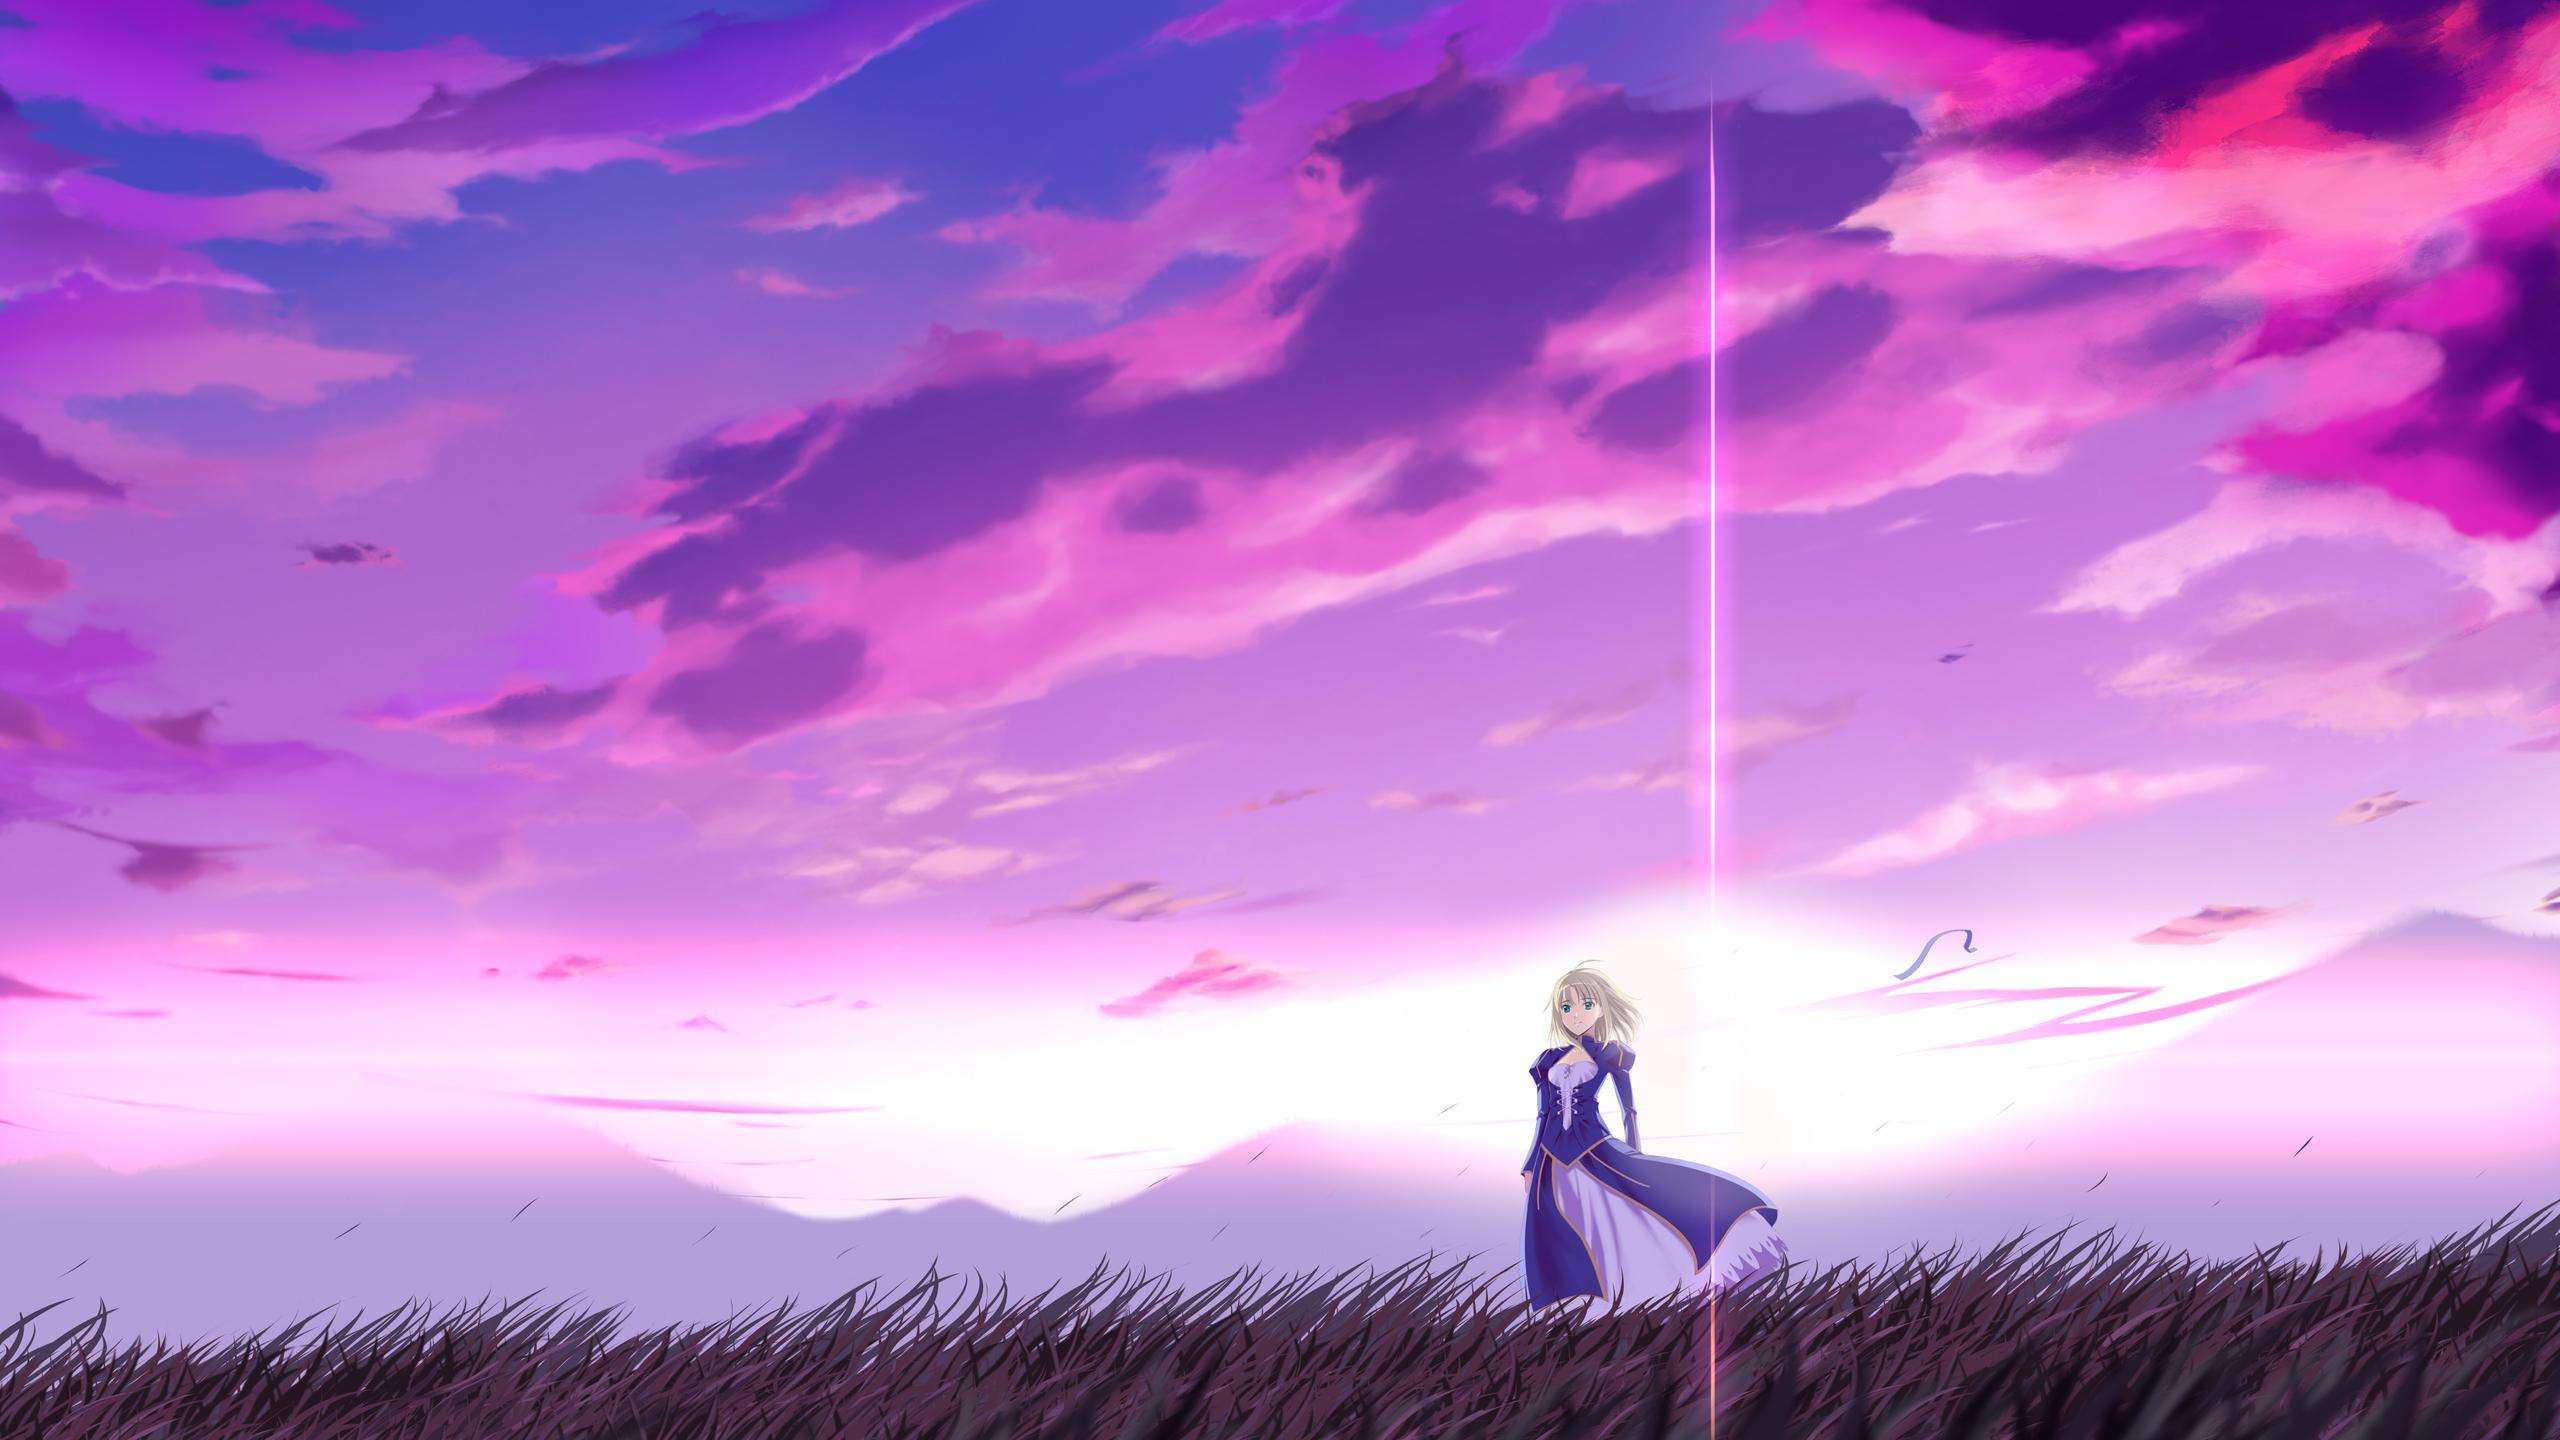 2560x1440 Anime Fate Stay Night 4k 1440P Resolution HD 4k ...